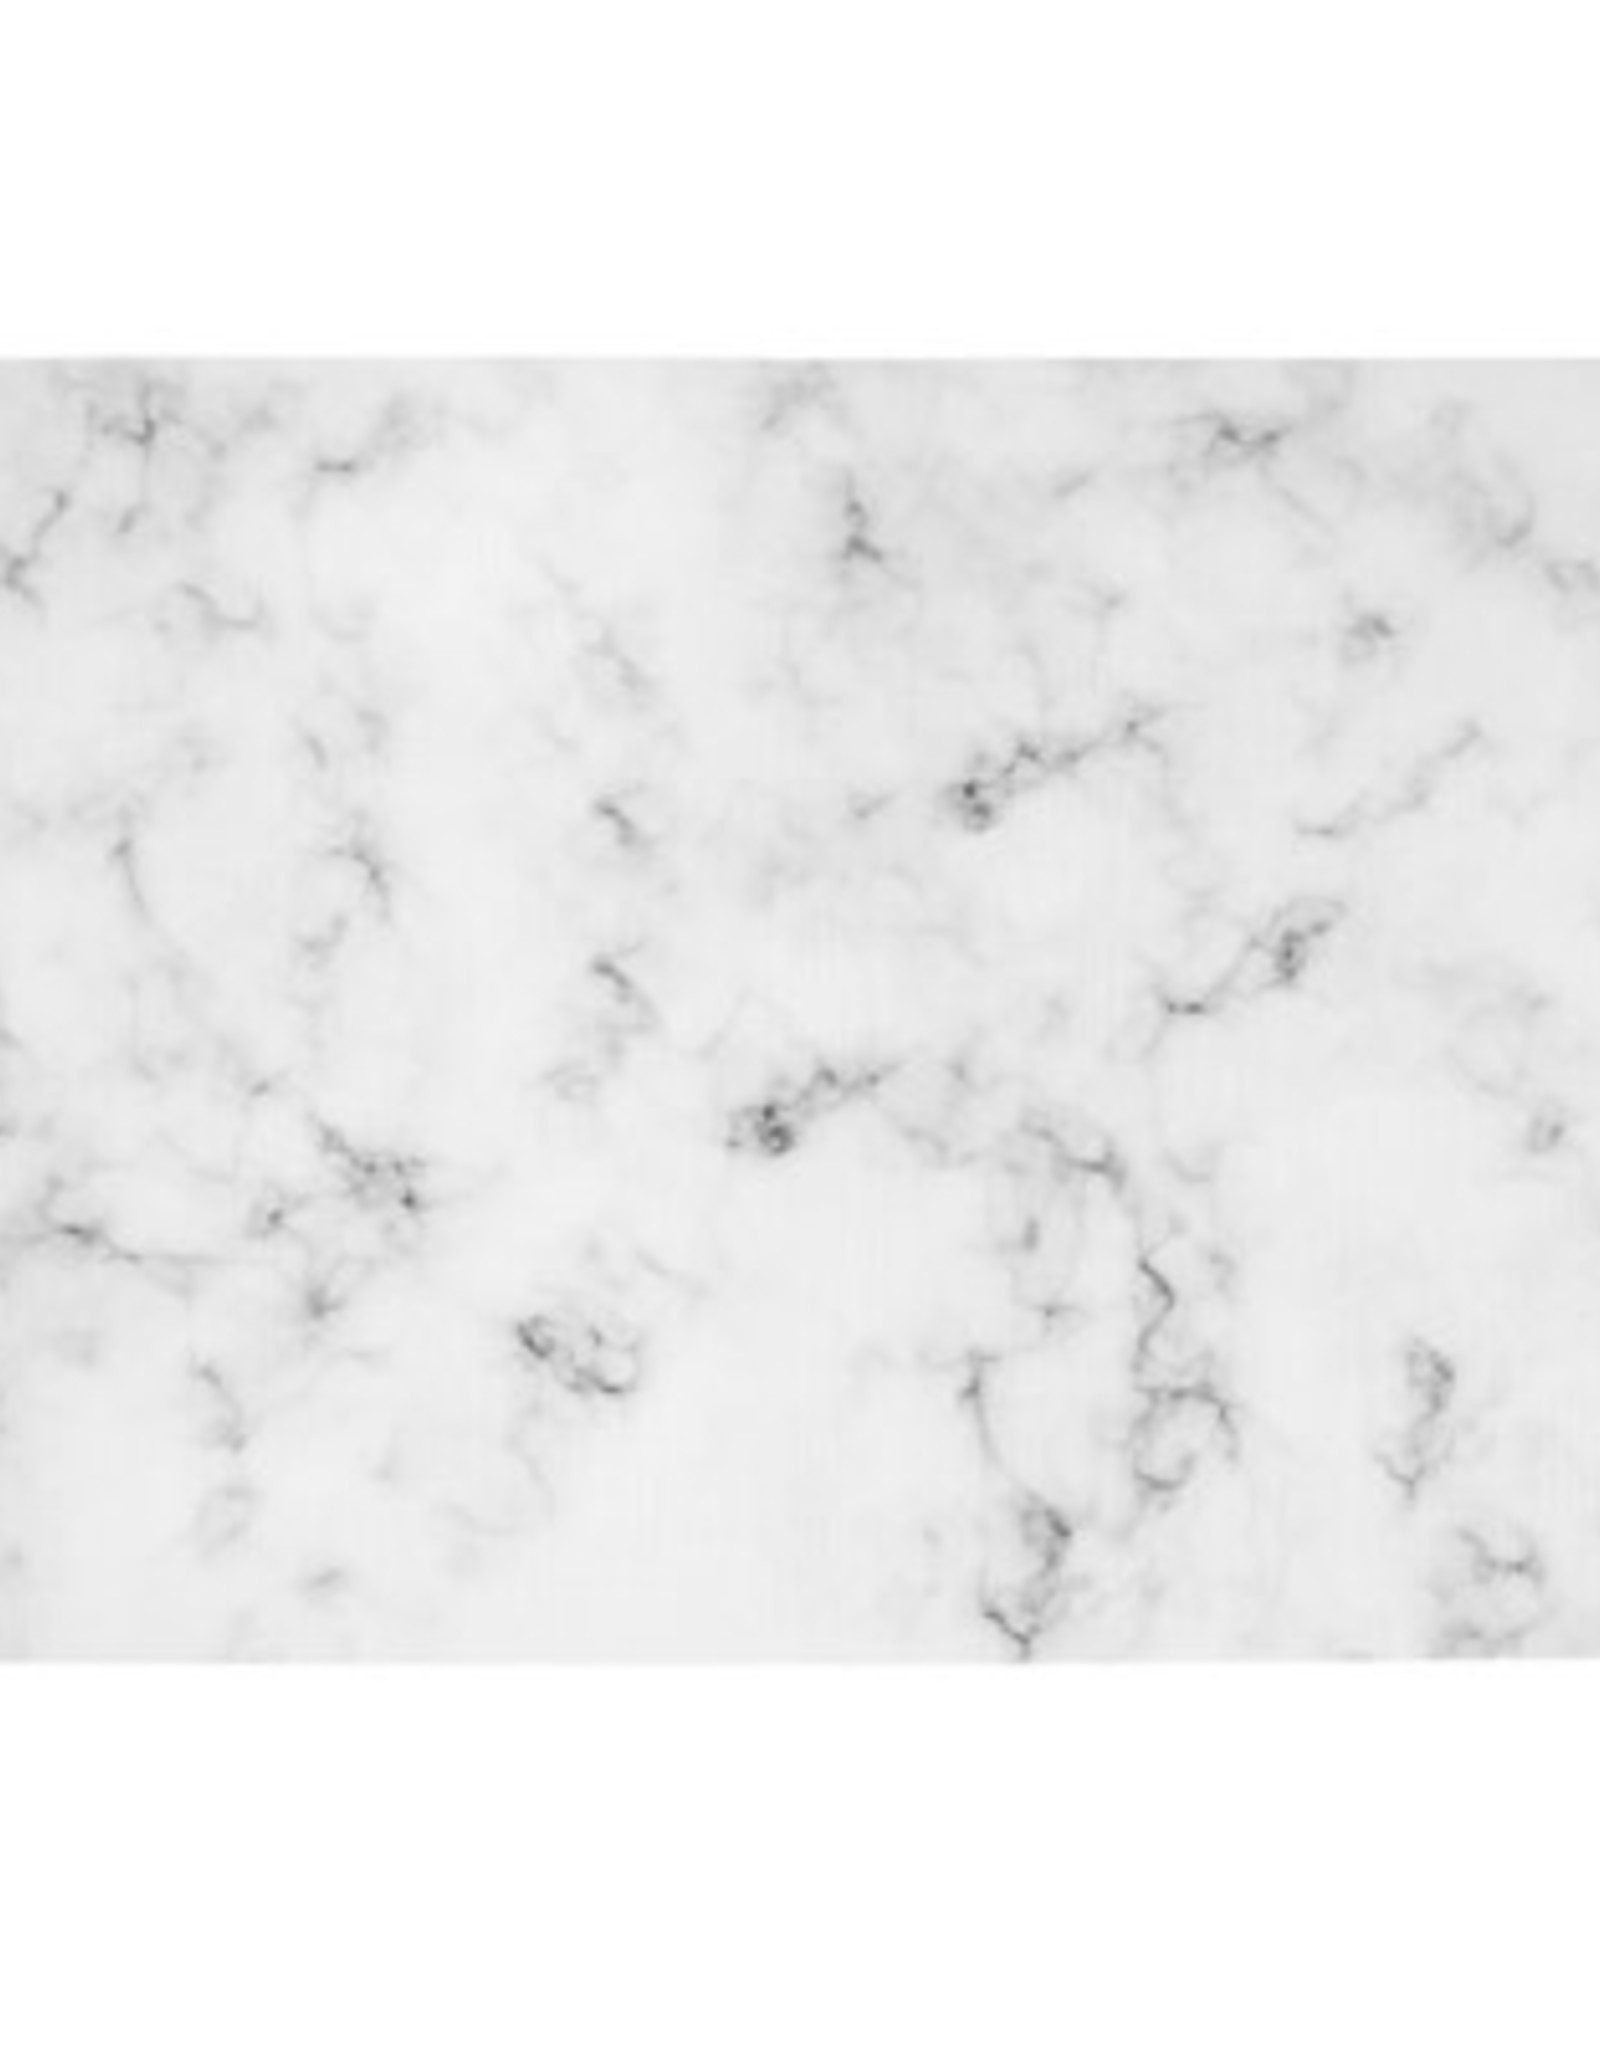 Placemat Harman Vinyl Marble White